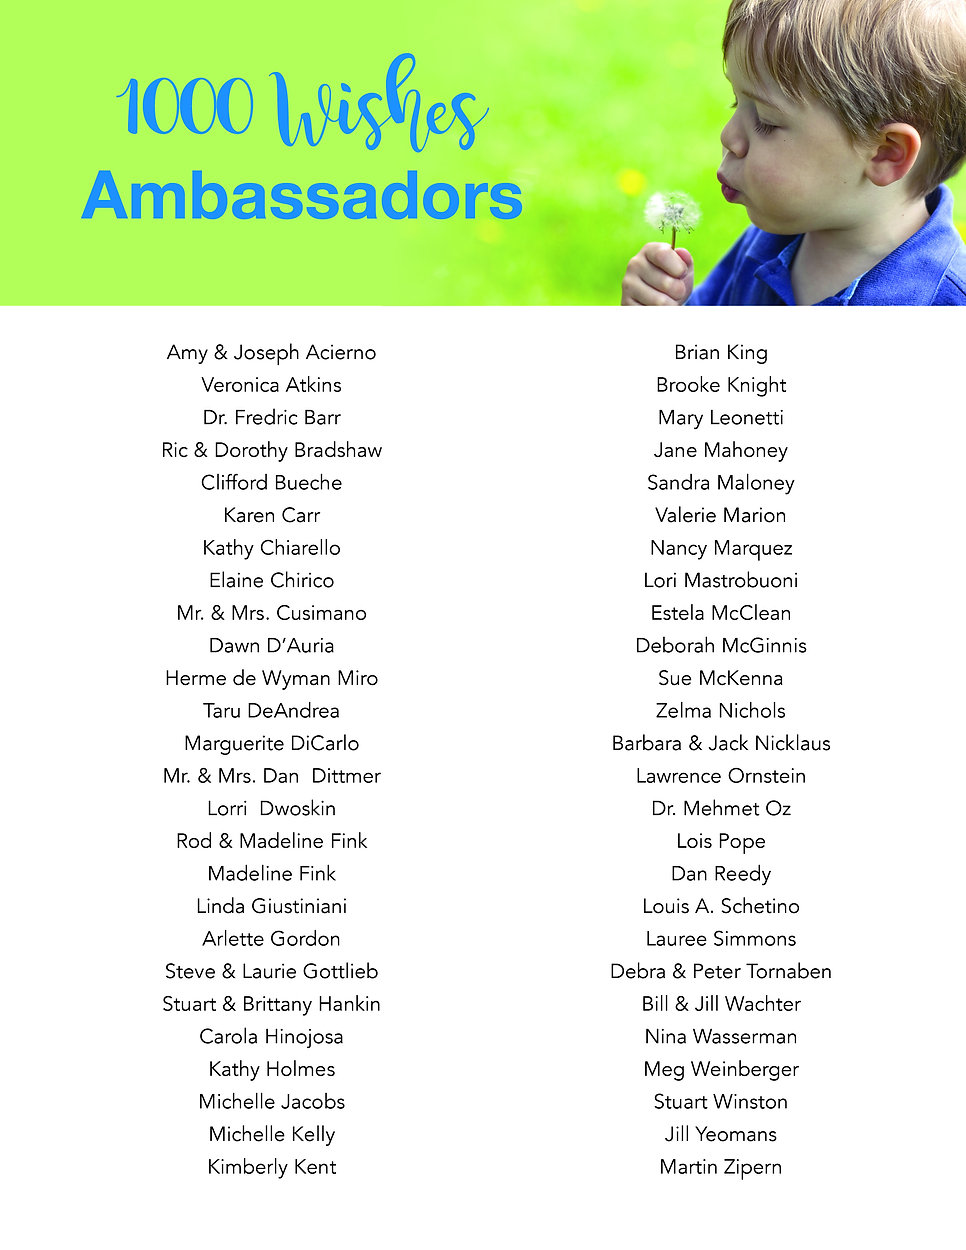 Ambassadors list.jpg